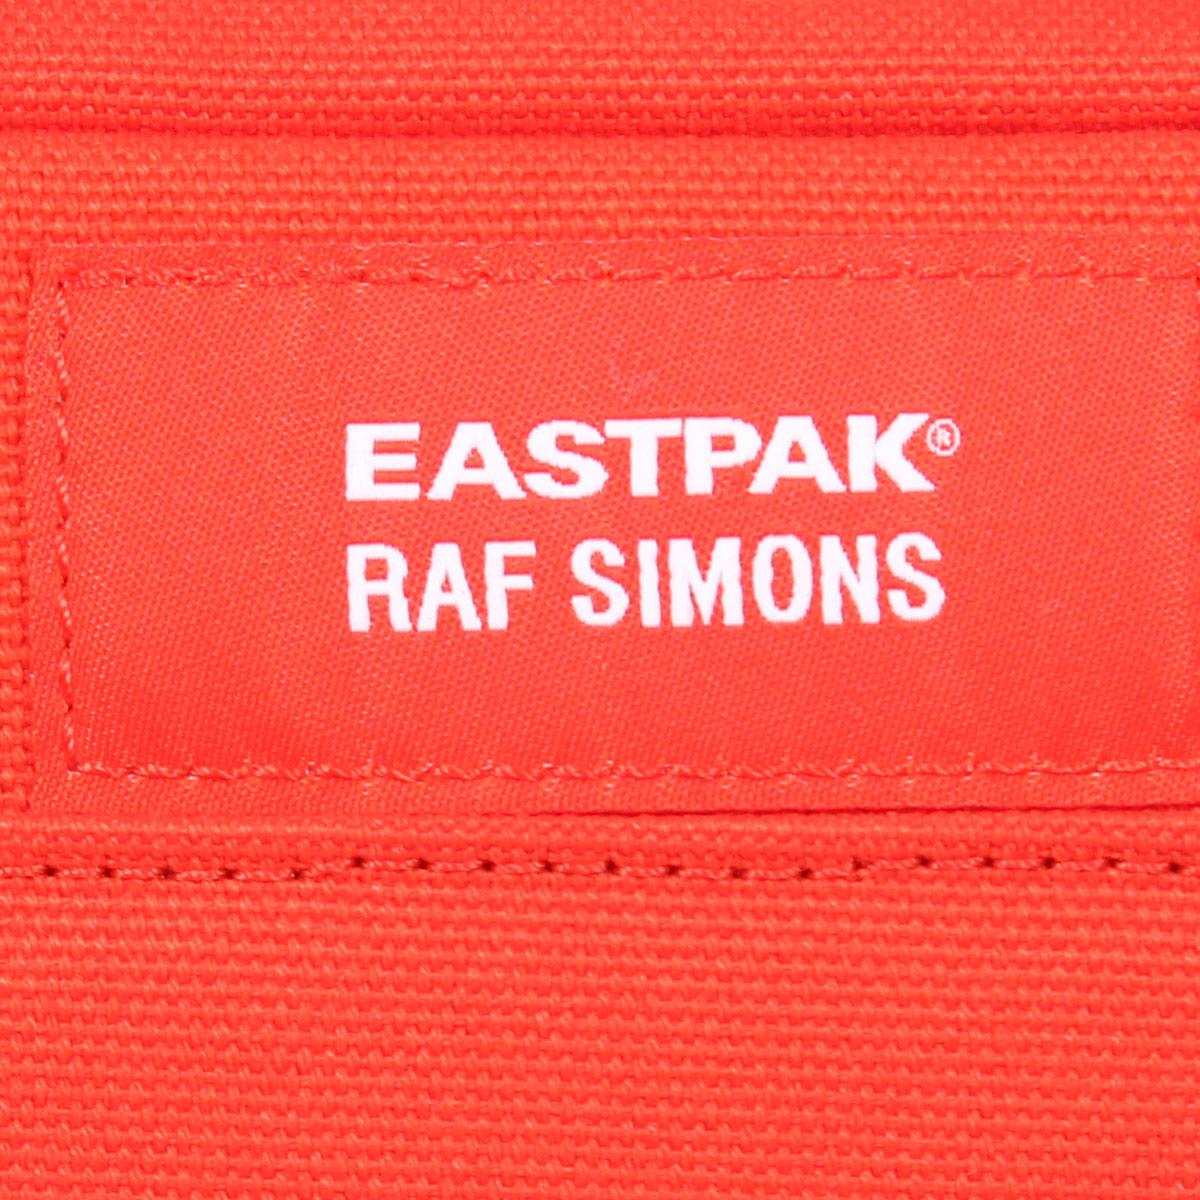 RAF SIMONS EASTPAK WAISTBAG LOOP ラフシモンズ イーストパック バッグ ウエストバッグ ボディバッグ ループ メンズ レディース 3L コラボ オレンジ EK94EkuZwPlXOiT